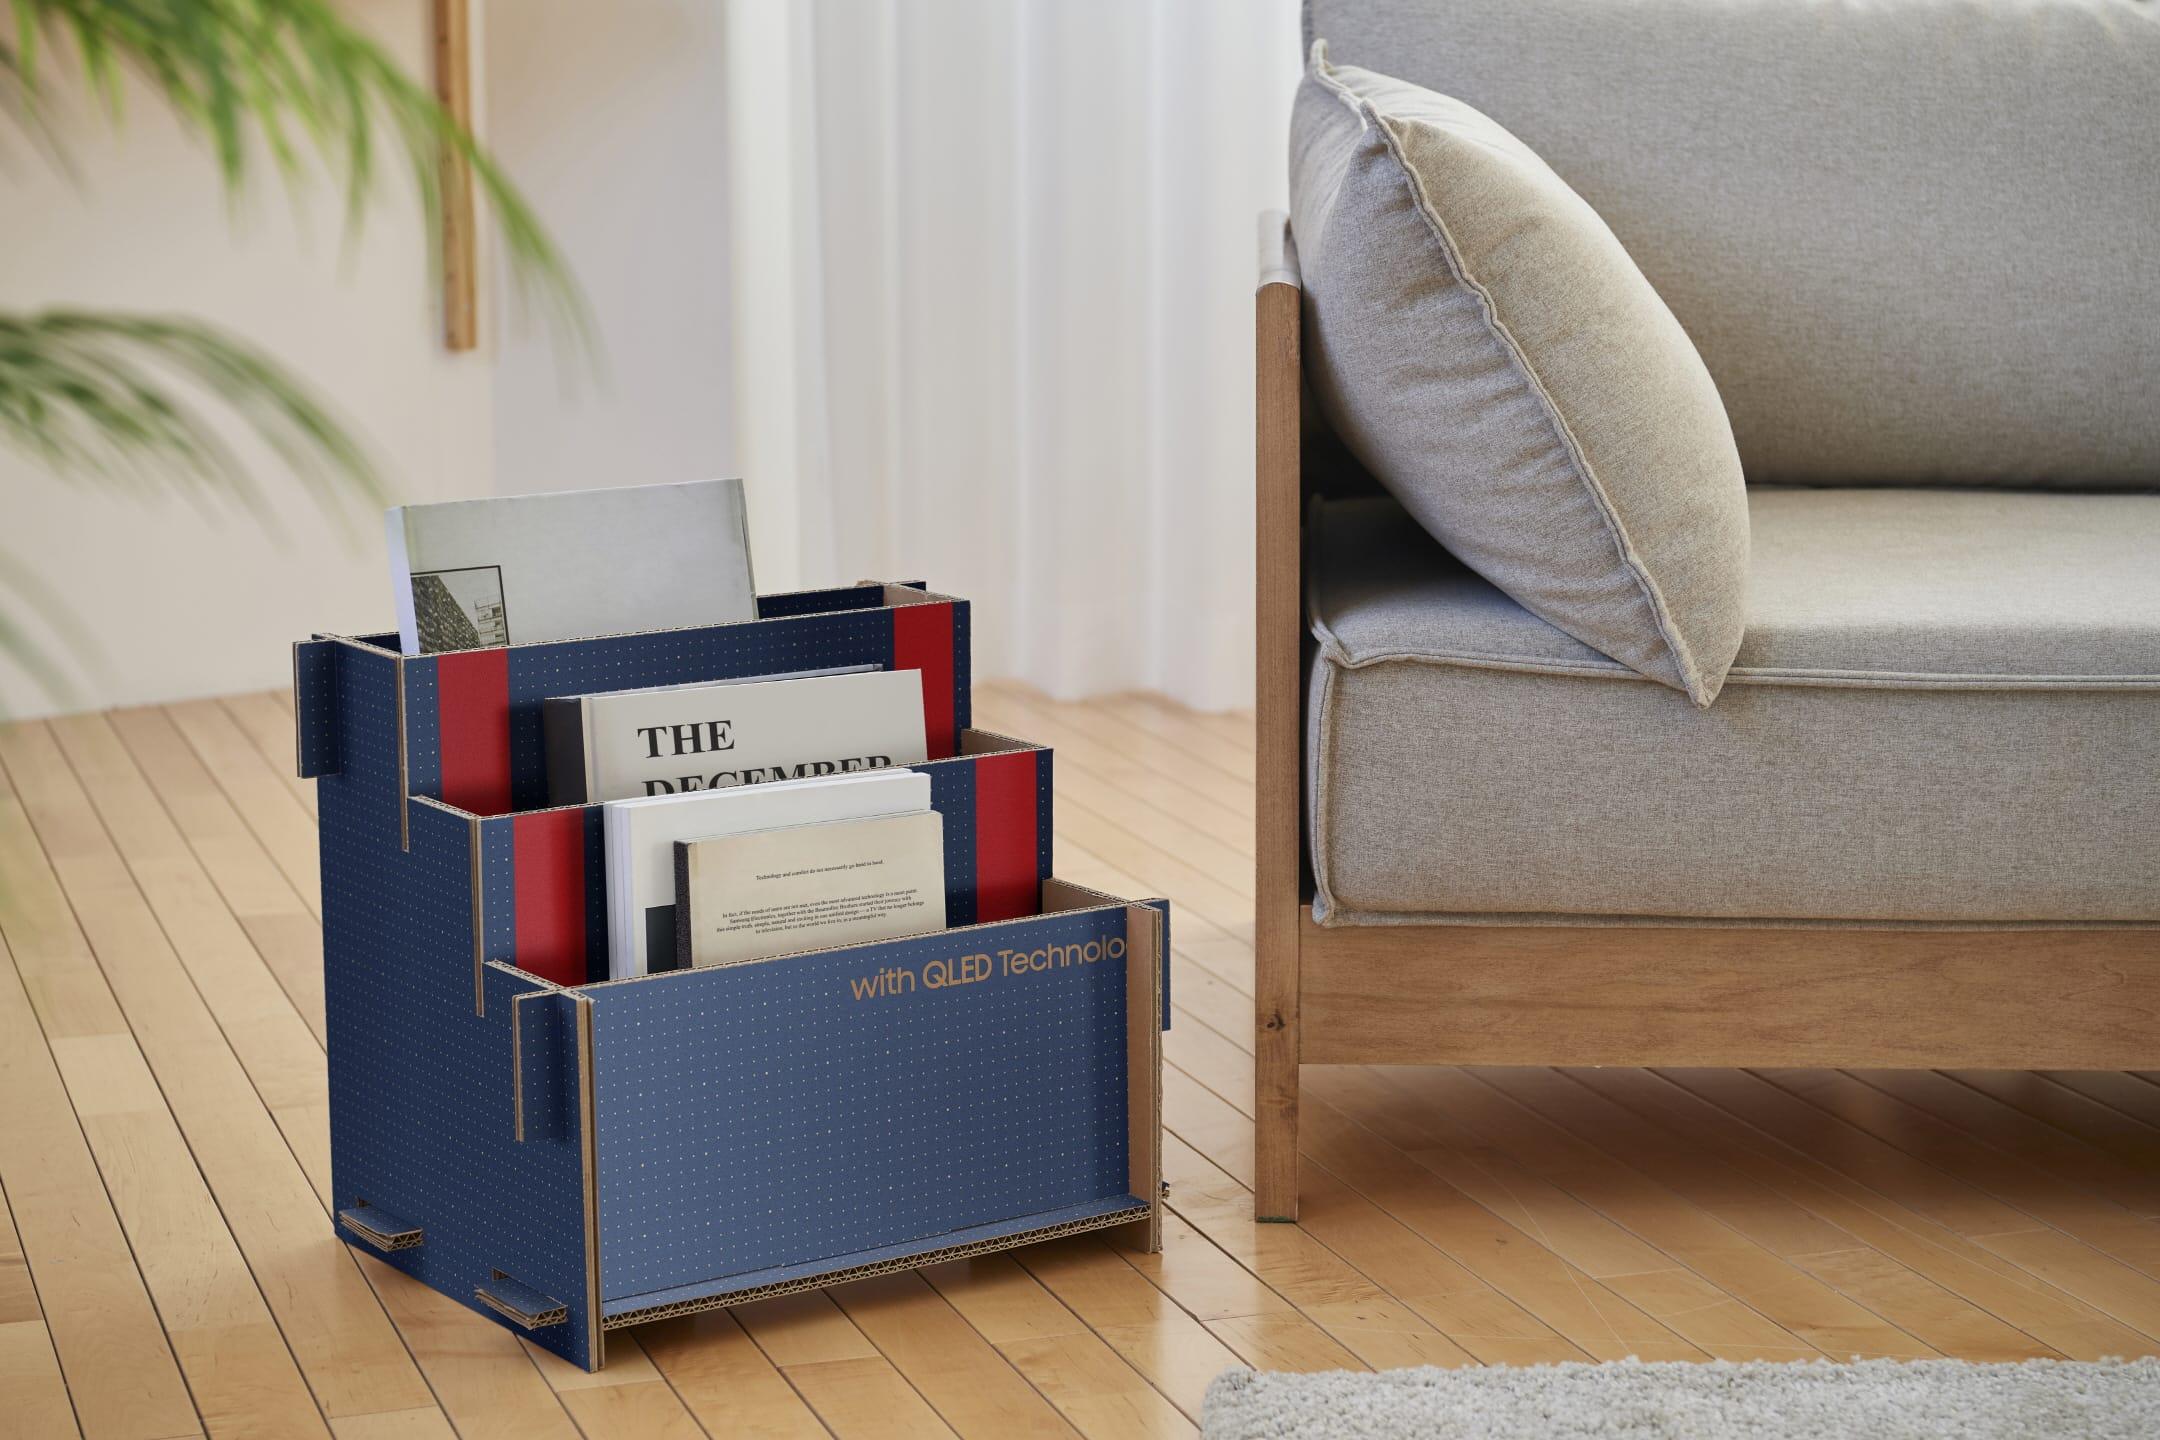 Samsung-TV-box-book-rack